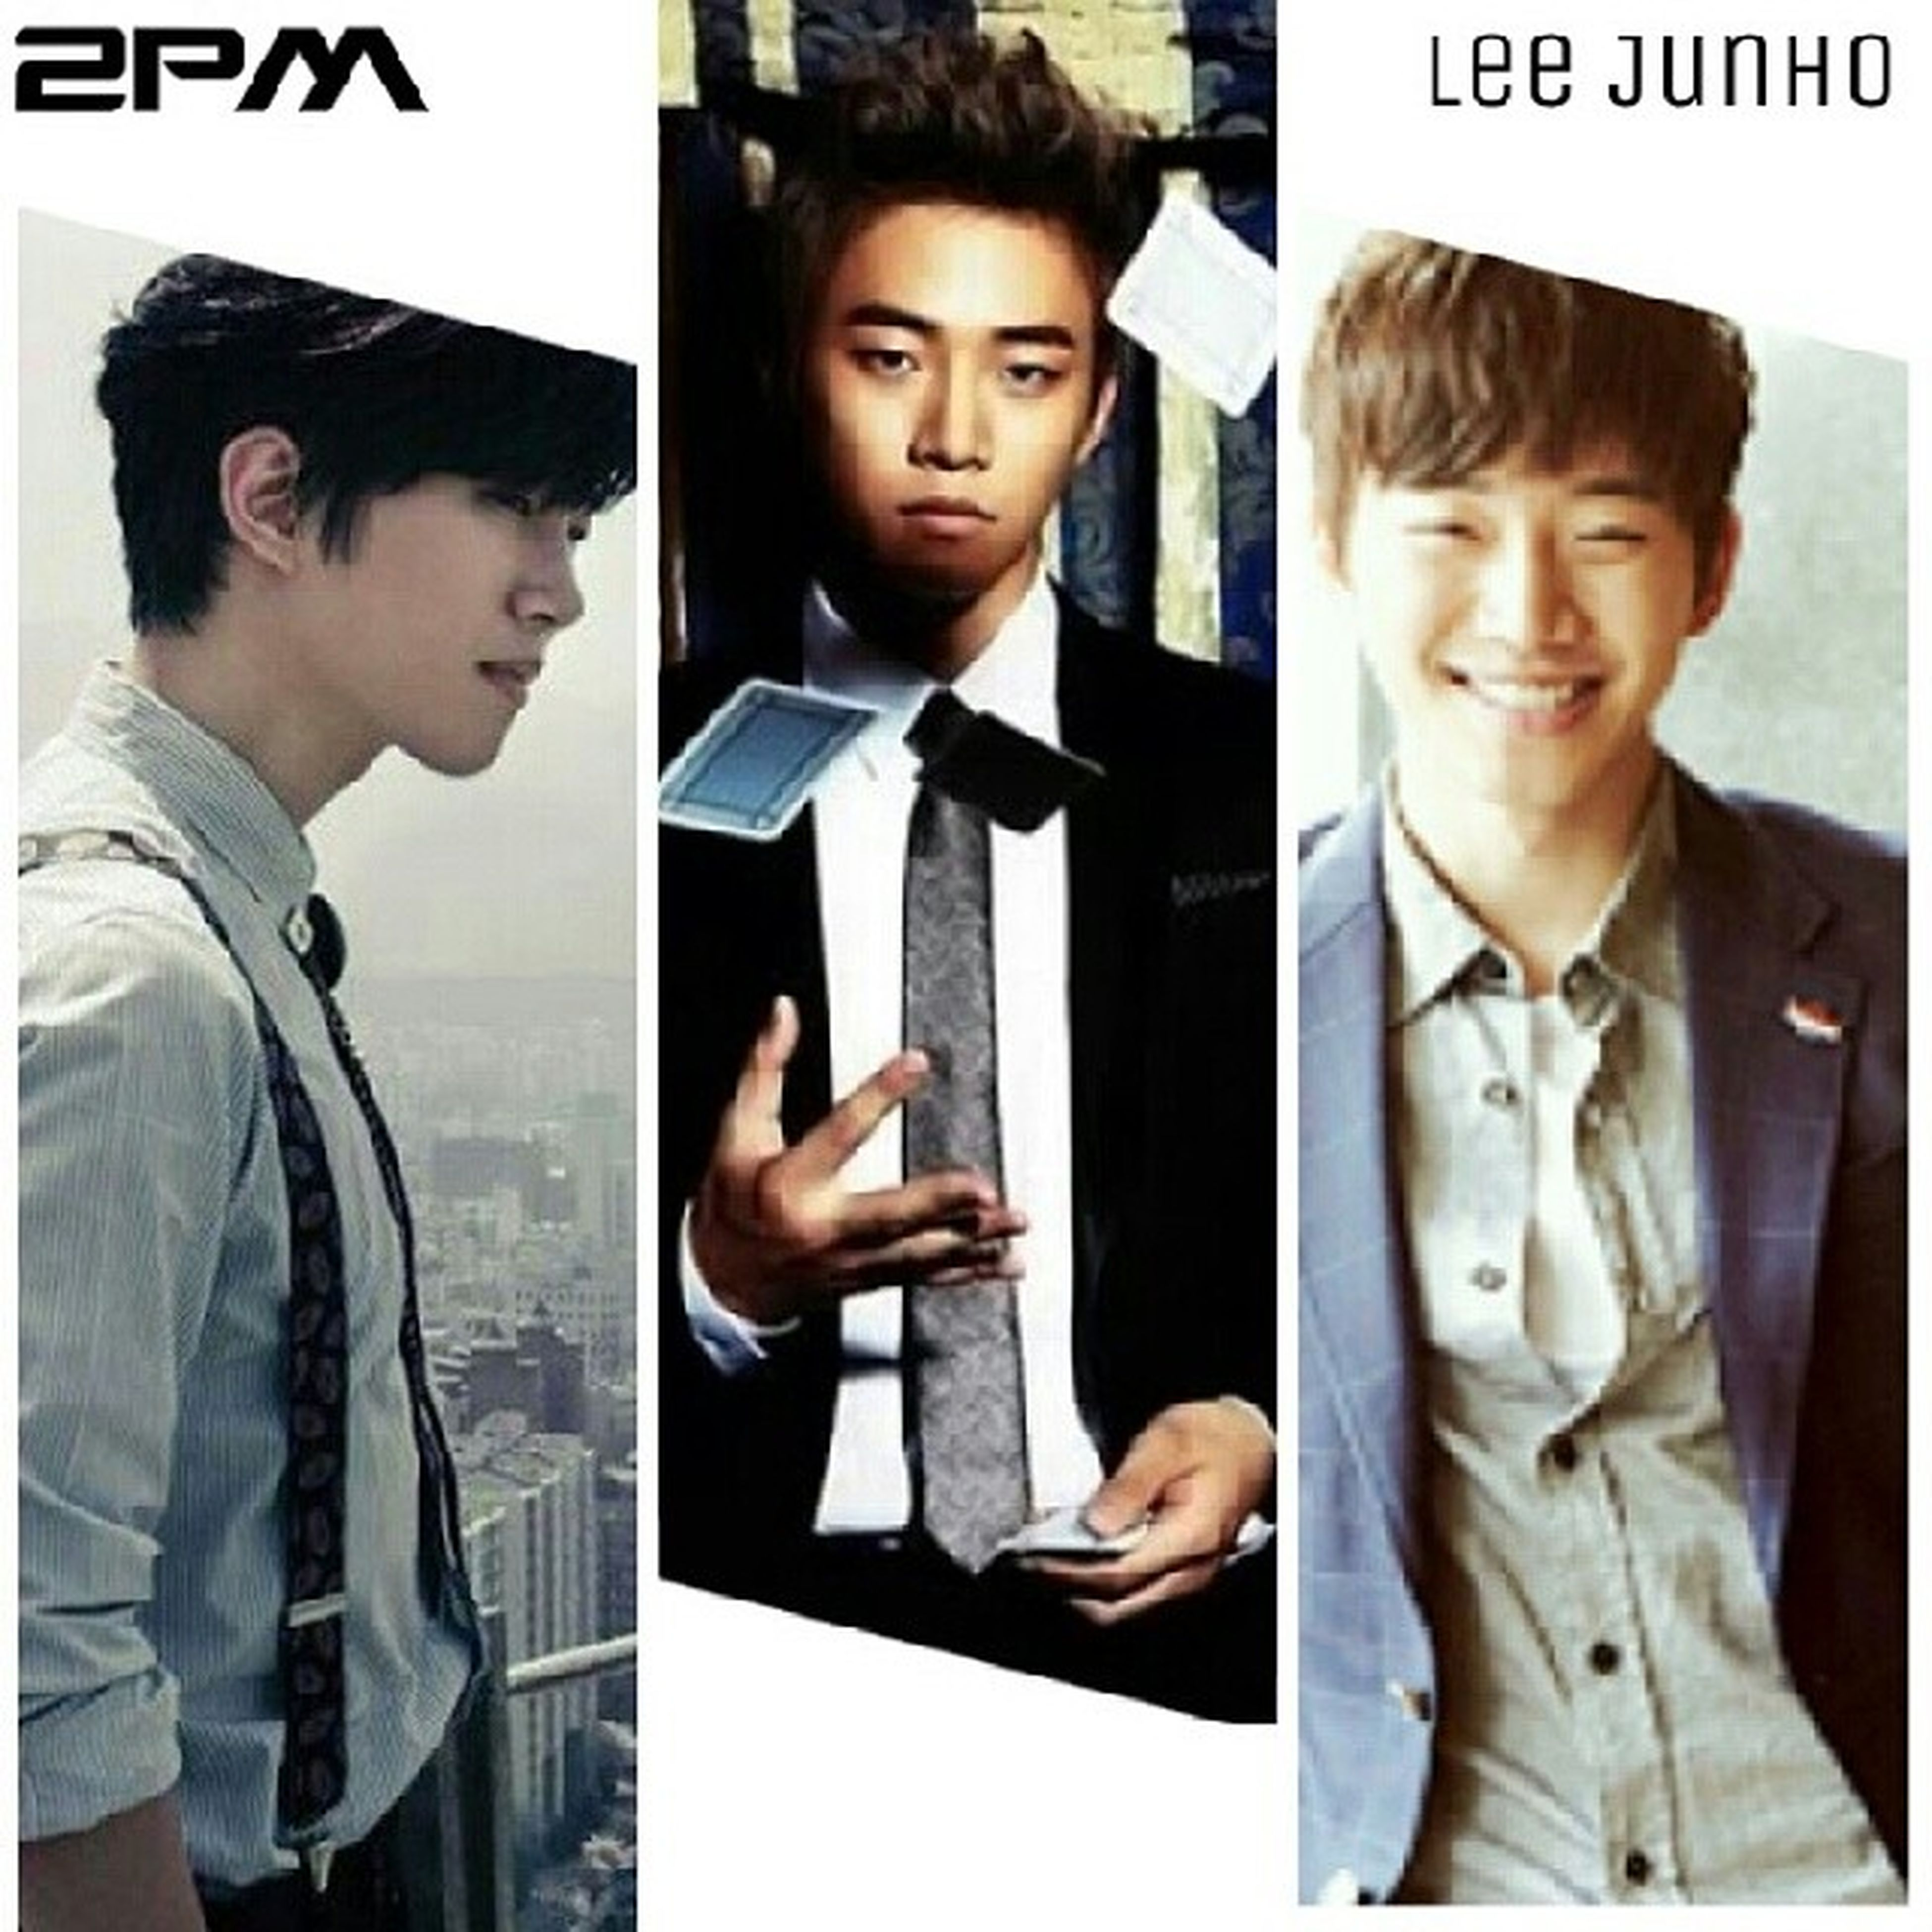 ItsNuneoday HappyBirthdayLeeJunho HappyBirthdayJunho HappyJunhoDay 2PM Hottest ♥♥♥♥♥